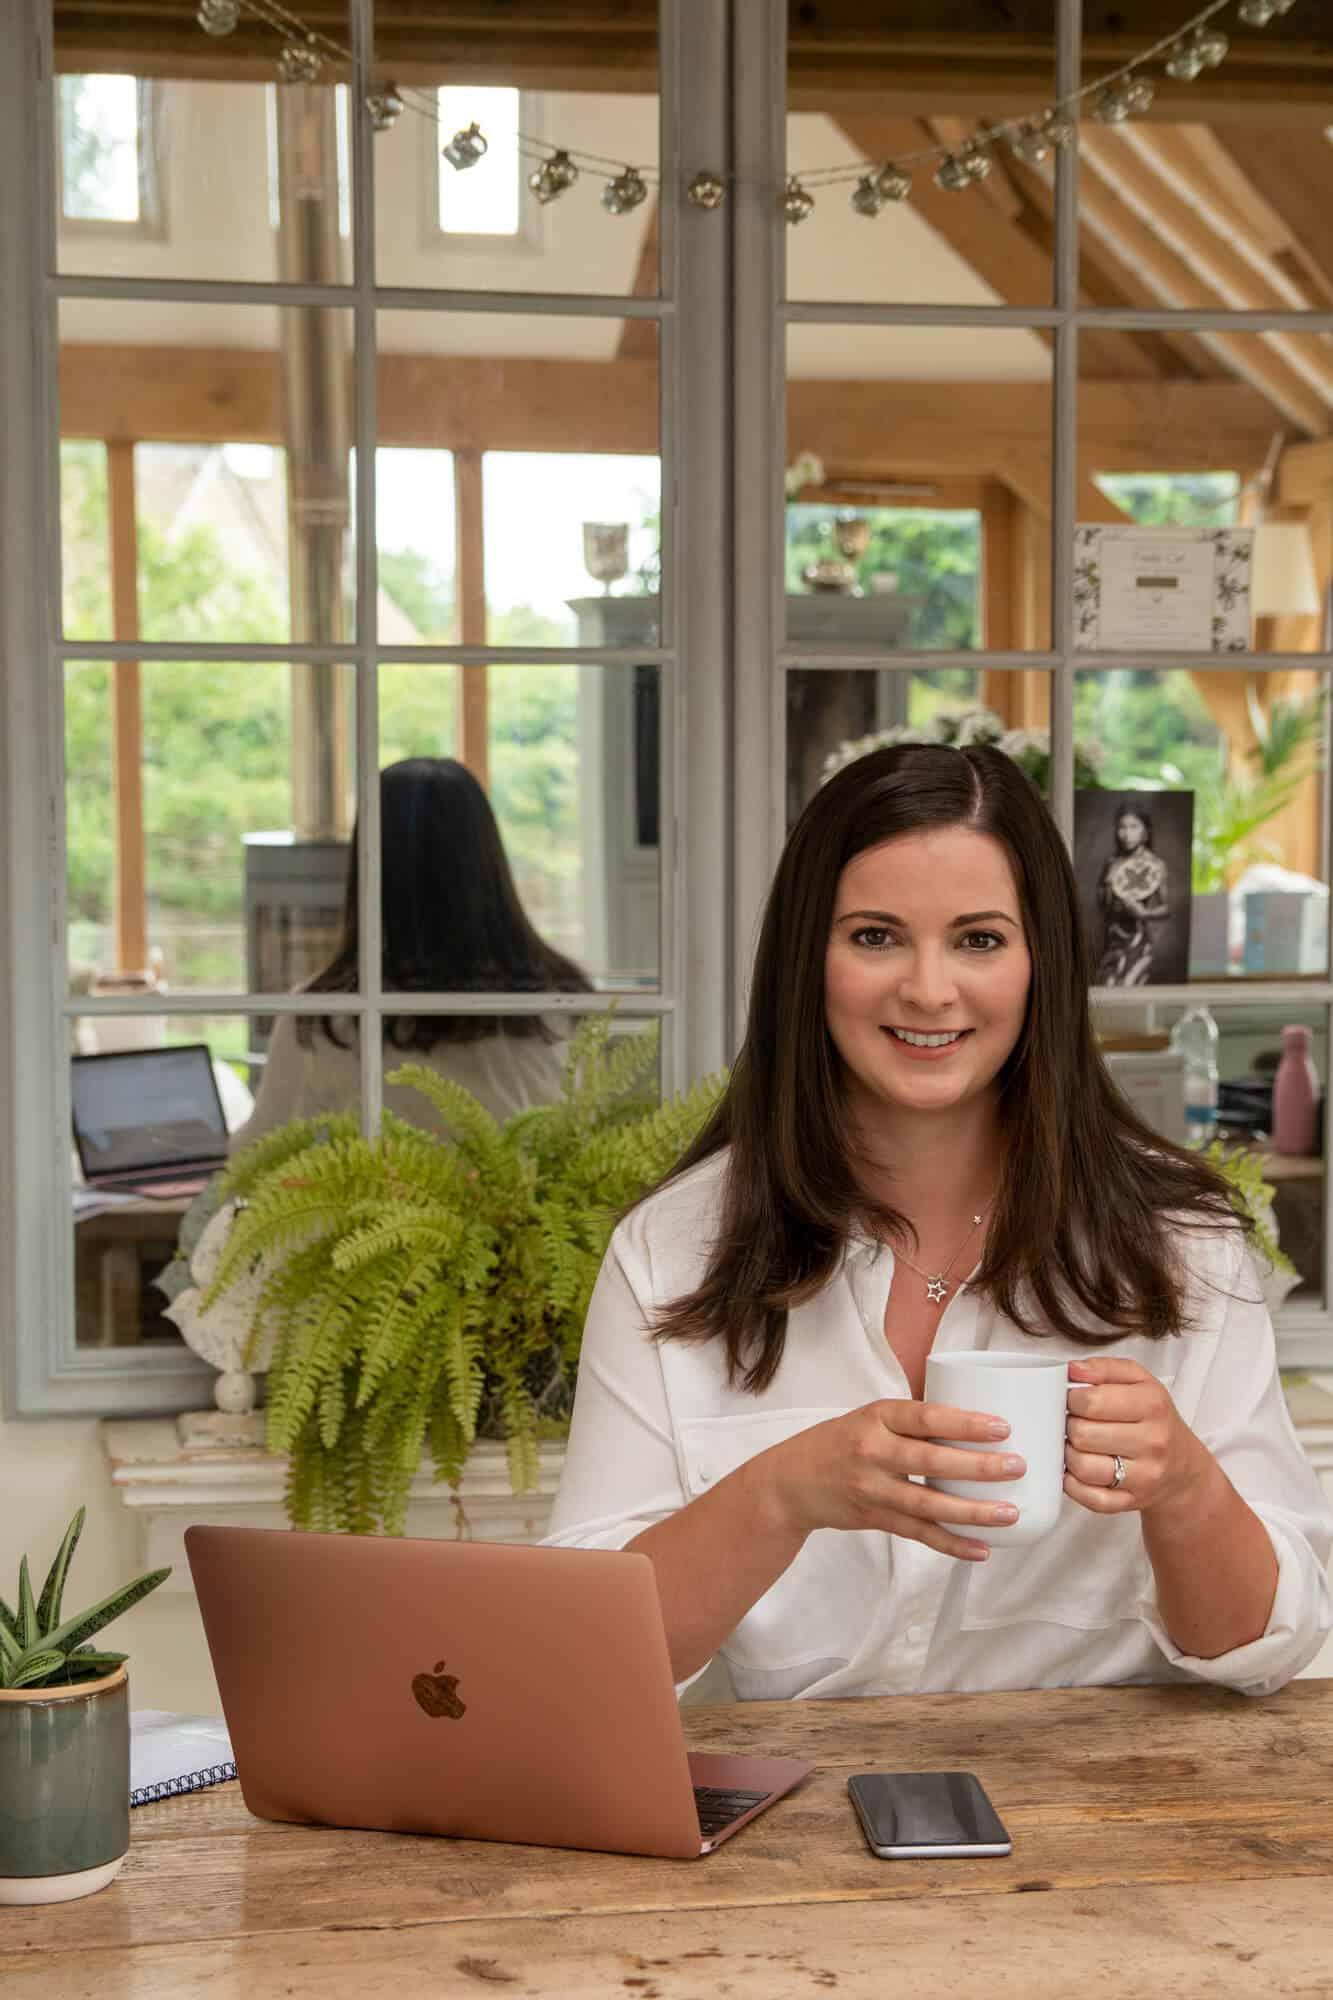 Rachael Gunn Online Business Manager Systems Strategist